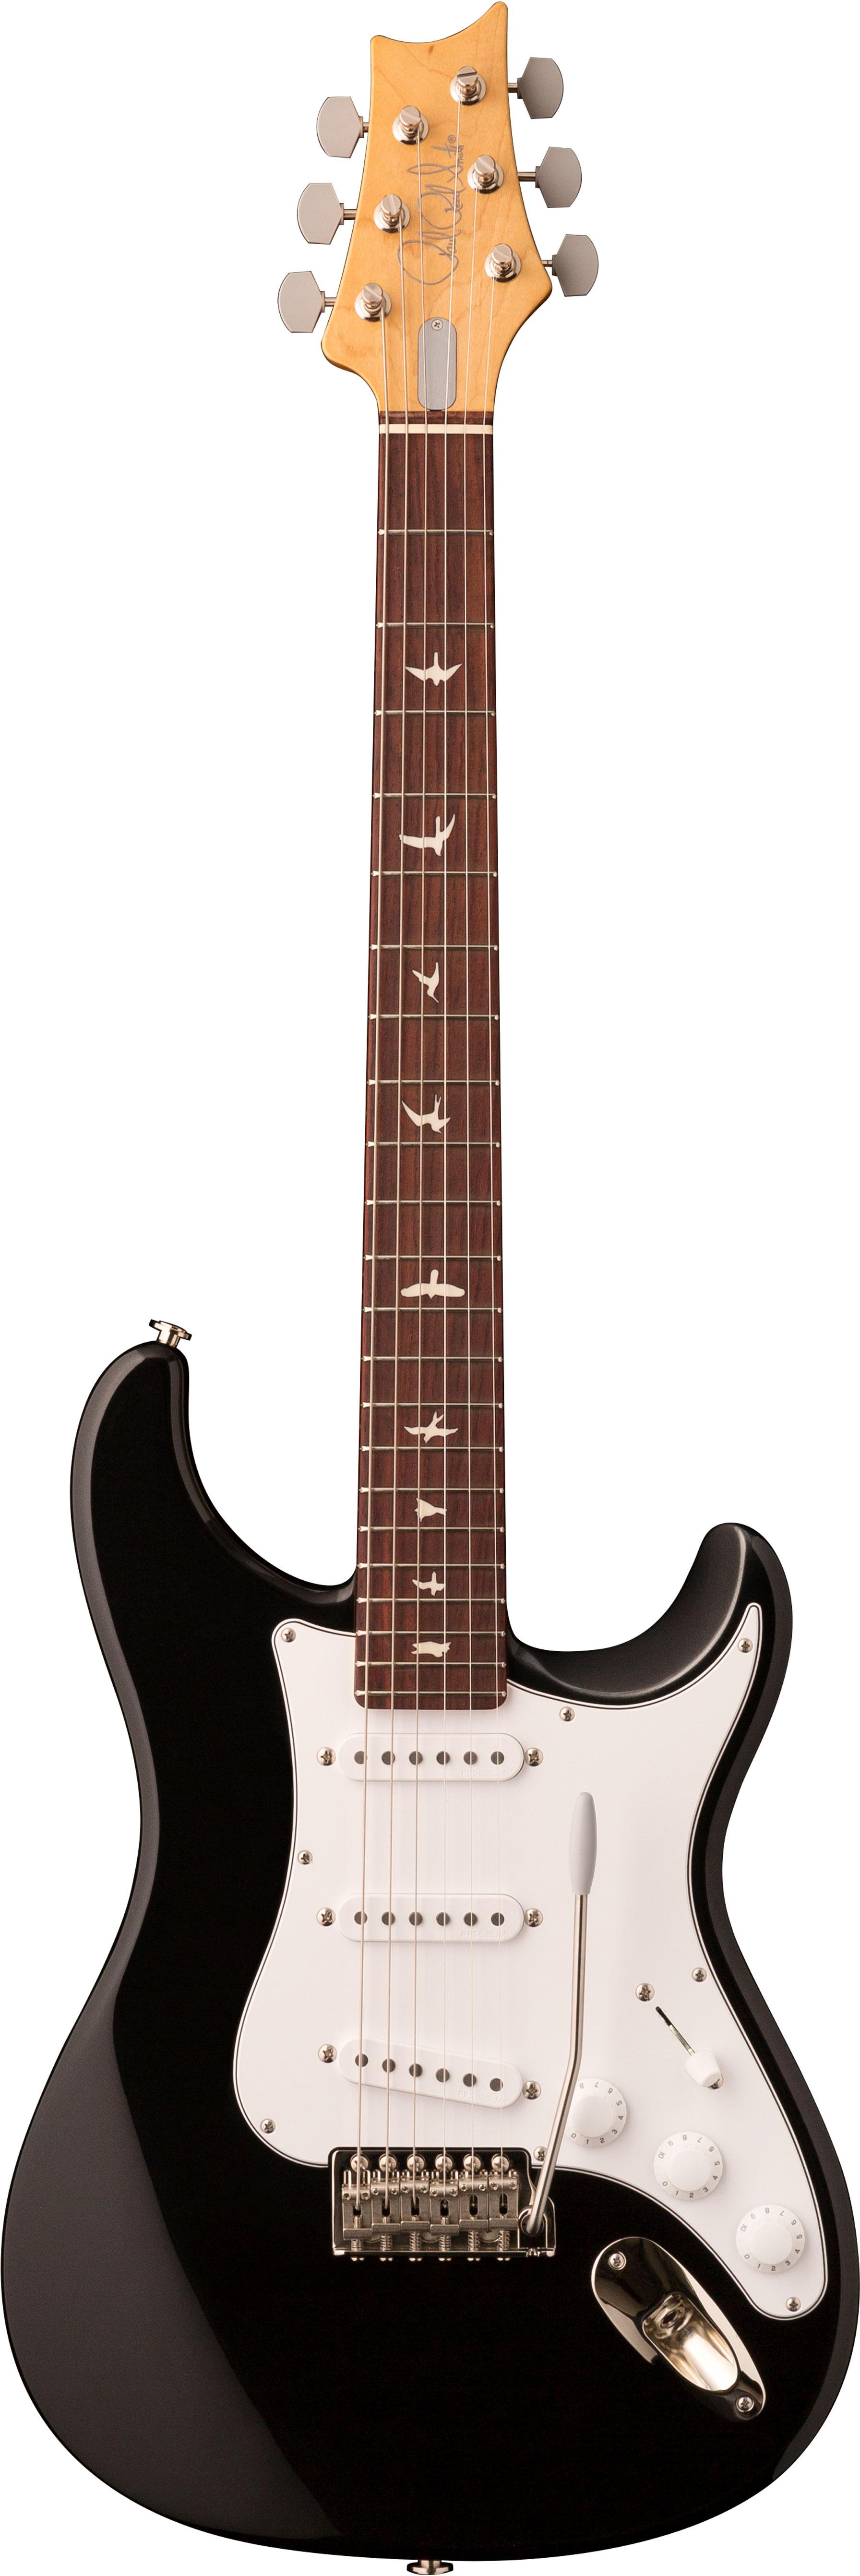 Prs guitars JM SILVER SKY ONYX